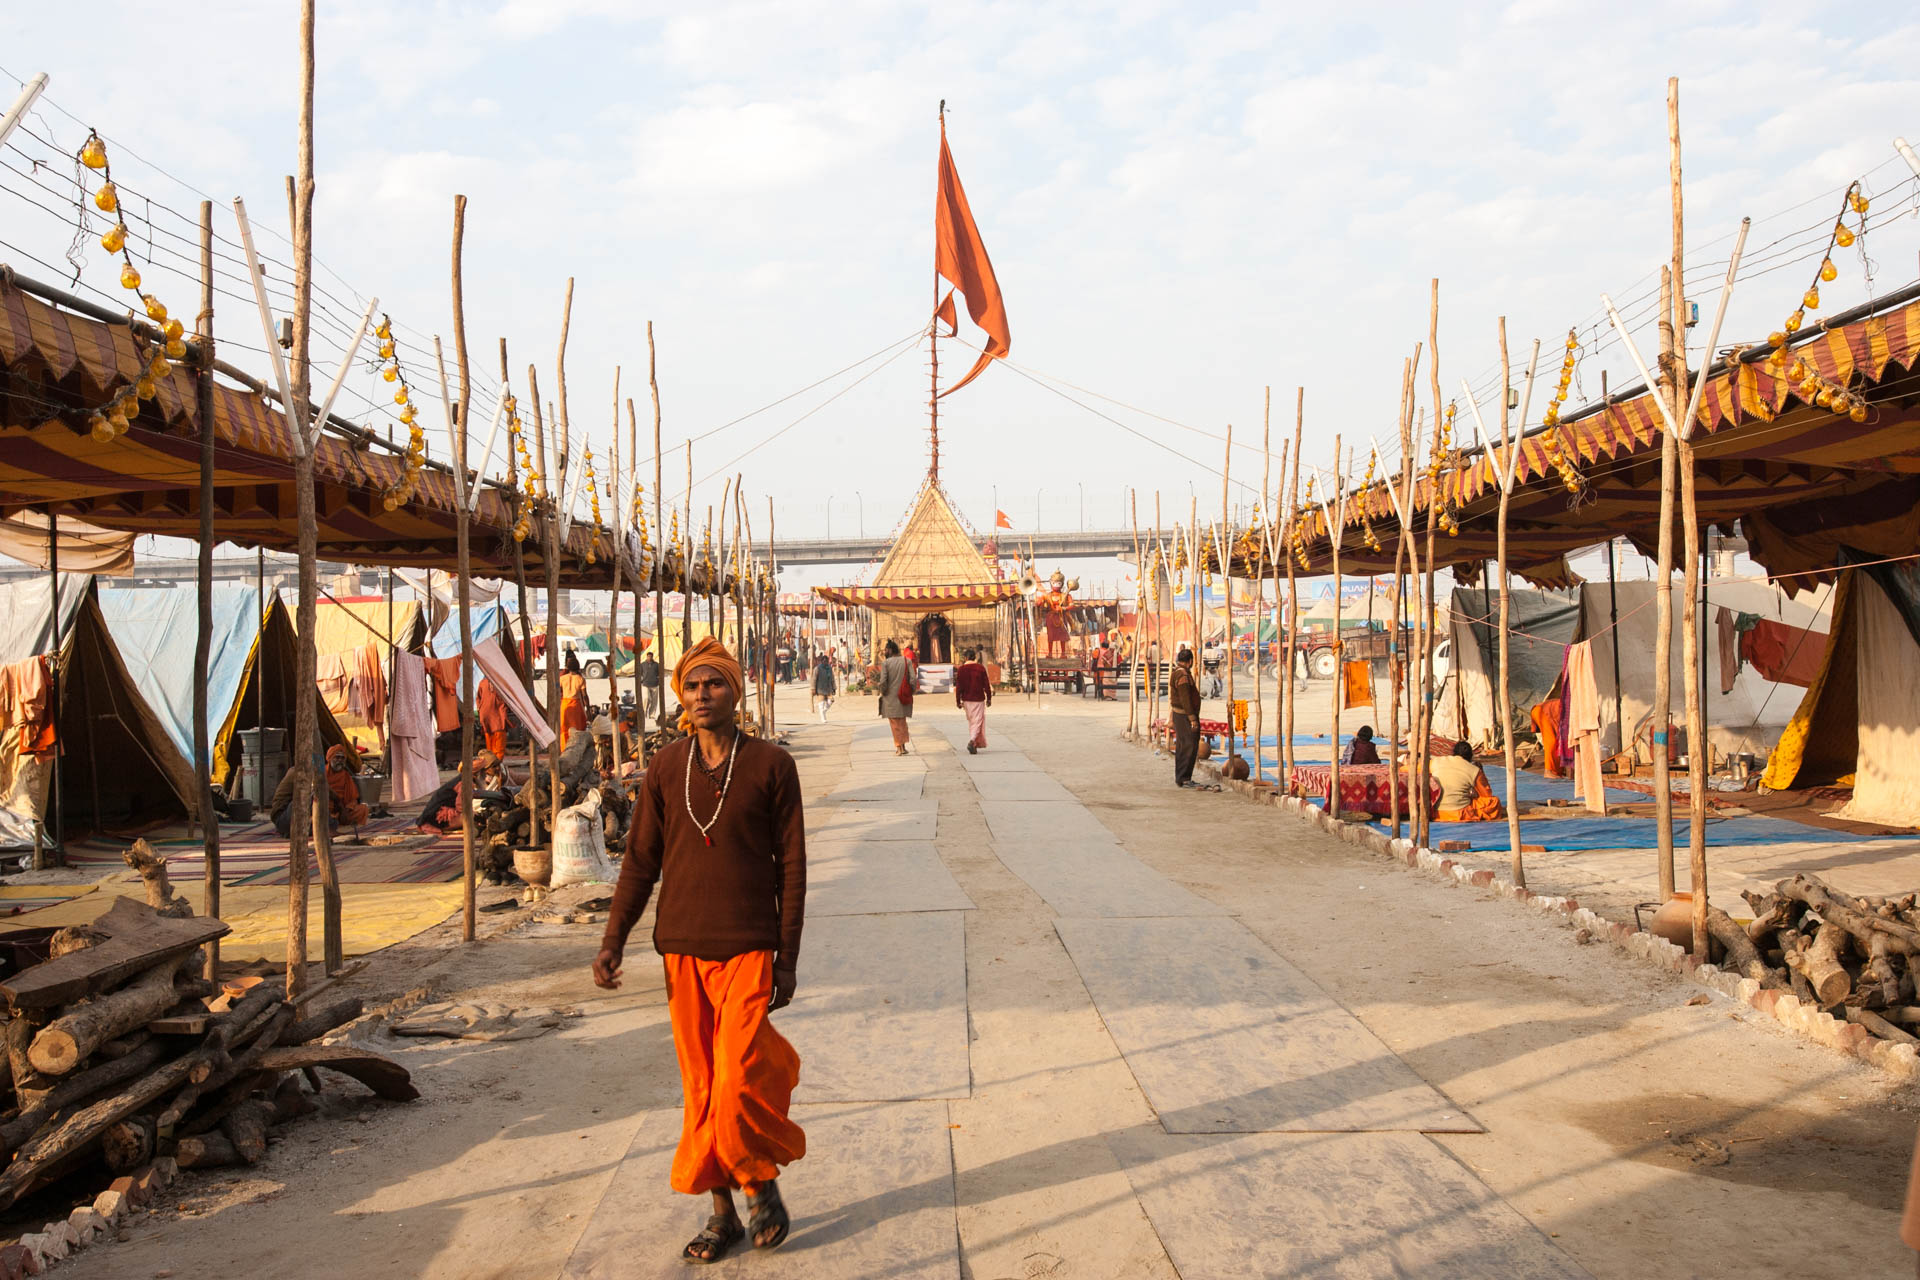 Allahbad, India - 14 January 2007At the confluence of the rivers Ganga, Yamuna and the invisible Sarasvati, Hindu pilgrims and Sadhu take bath in the sacred waters  on the occasion of Ard Kumbh Mela, every 6 years: Sadhu's camp.© GIANNI GIANSANTI